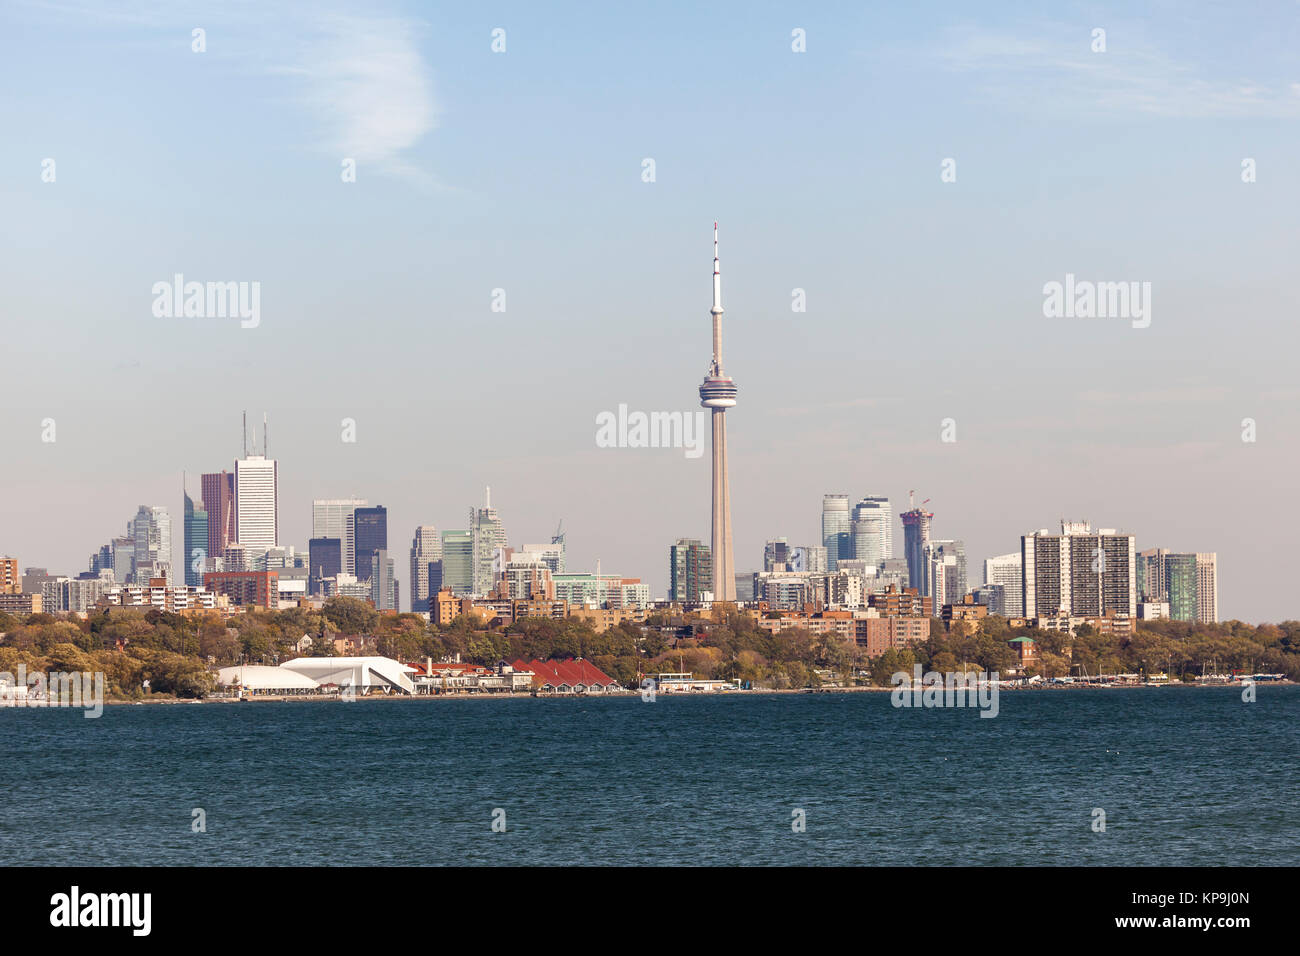 Skyline of Toronto downtown. Province of Ontario, Canada Stock Photo